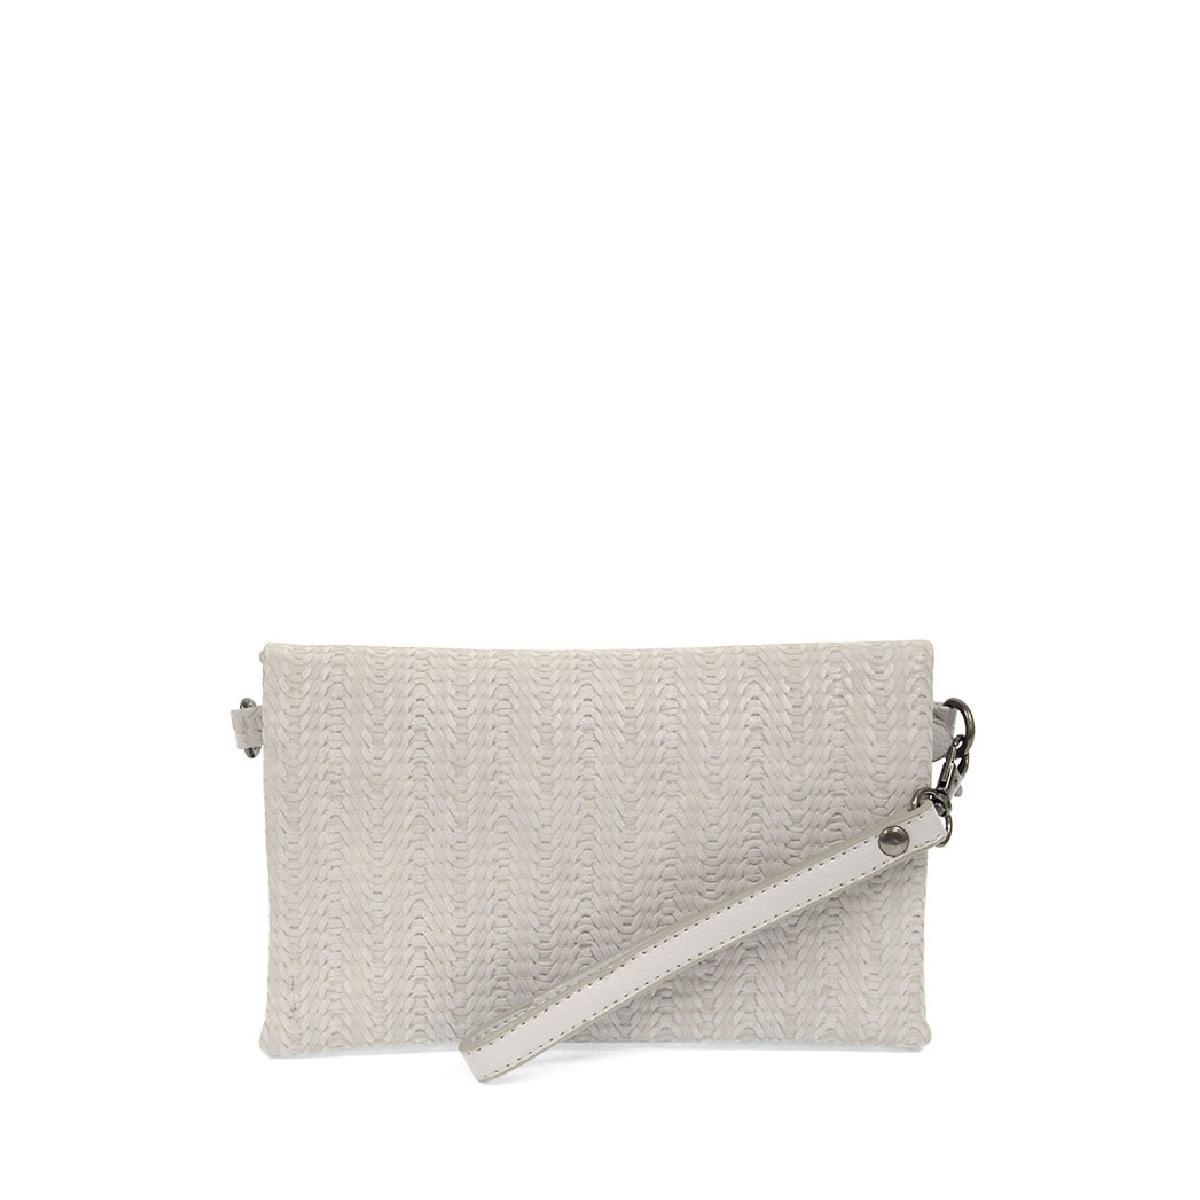 Joy Susan Joy Susan Kate Crossbody Handbag Soft Grey Woven